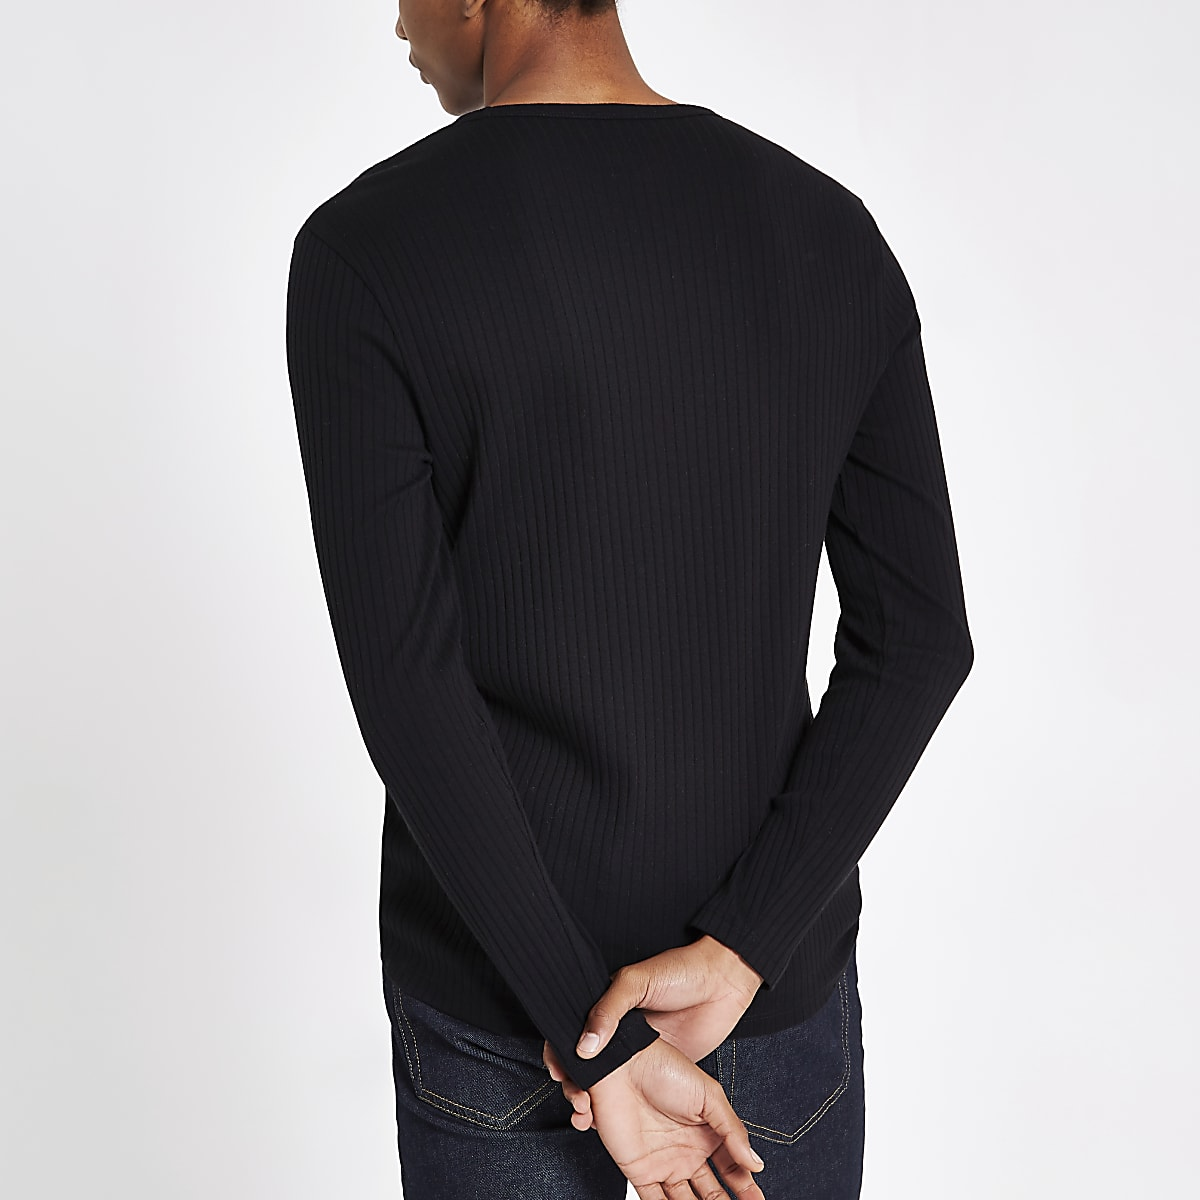 7e7d0a56d63563 Black ribbed slim fit long sleeve T-shirt - Long Sleeve T-Shirts - T ...